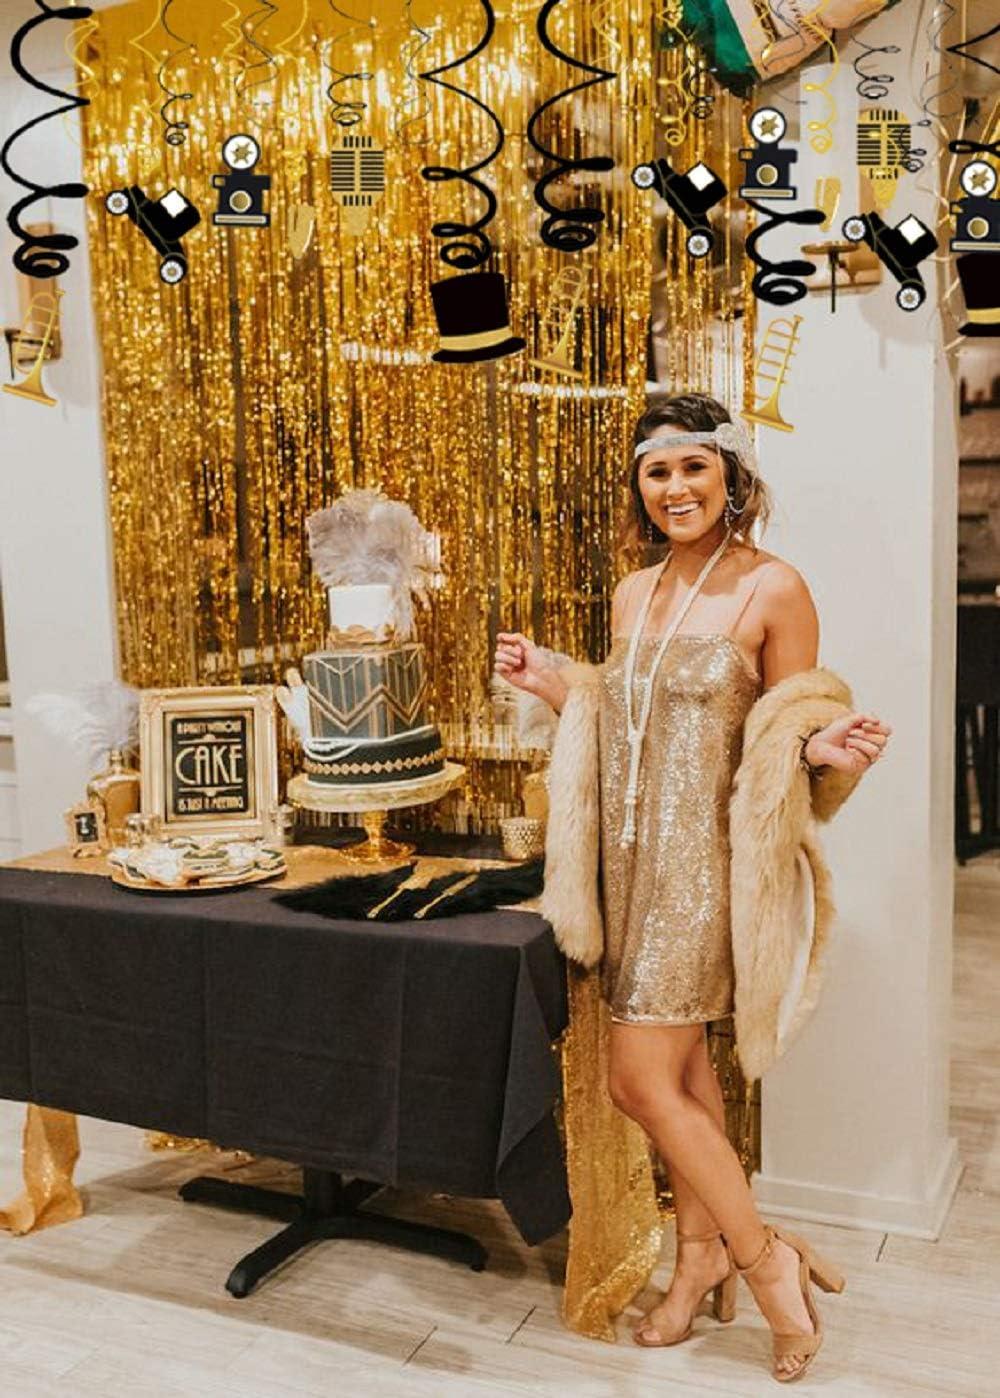 JeVenis Roaring 20s Swirl Banner Great Gatsby Birthday Decor 20th Birthday Party Decoration 20 Anniversary Decorations Roaring 20s Flapper Party Roaring Twenties Birthday Banner